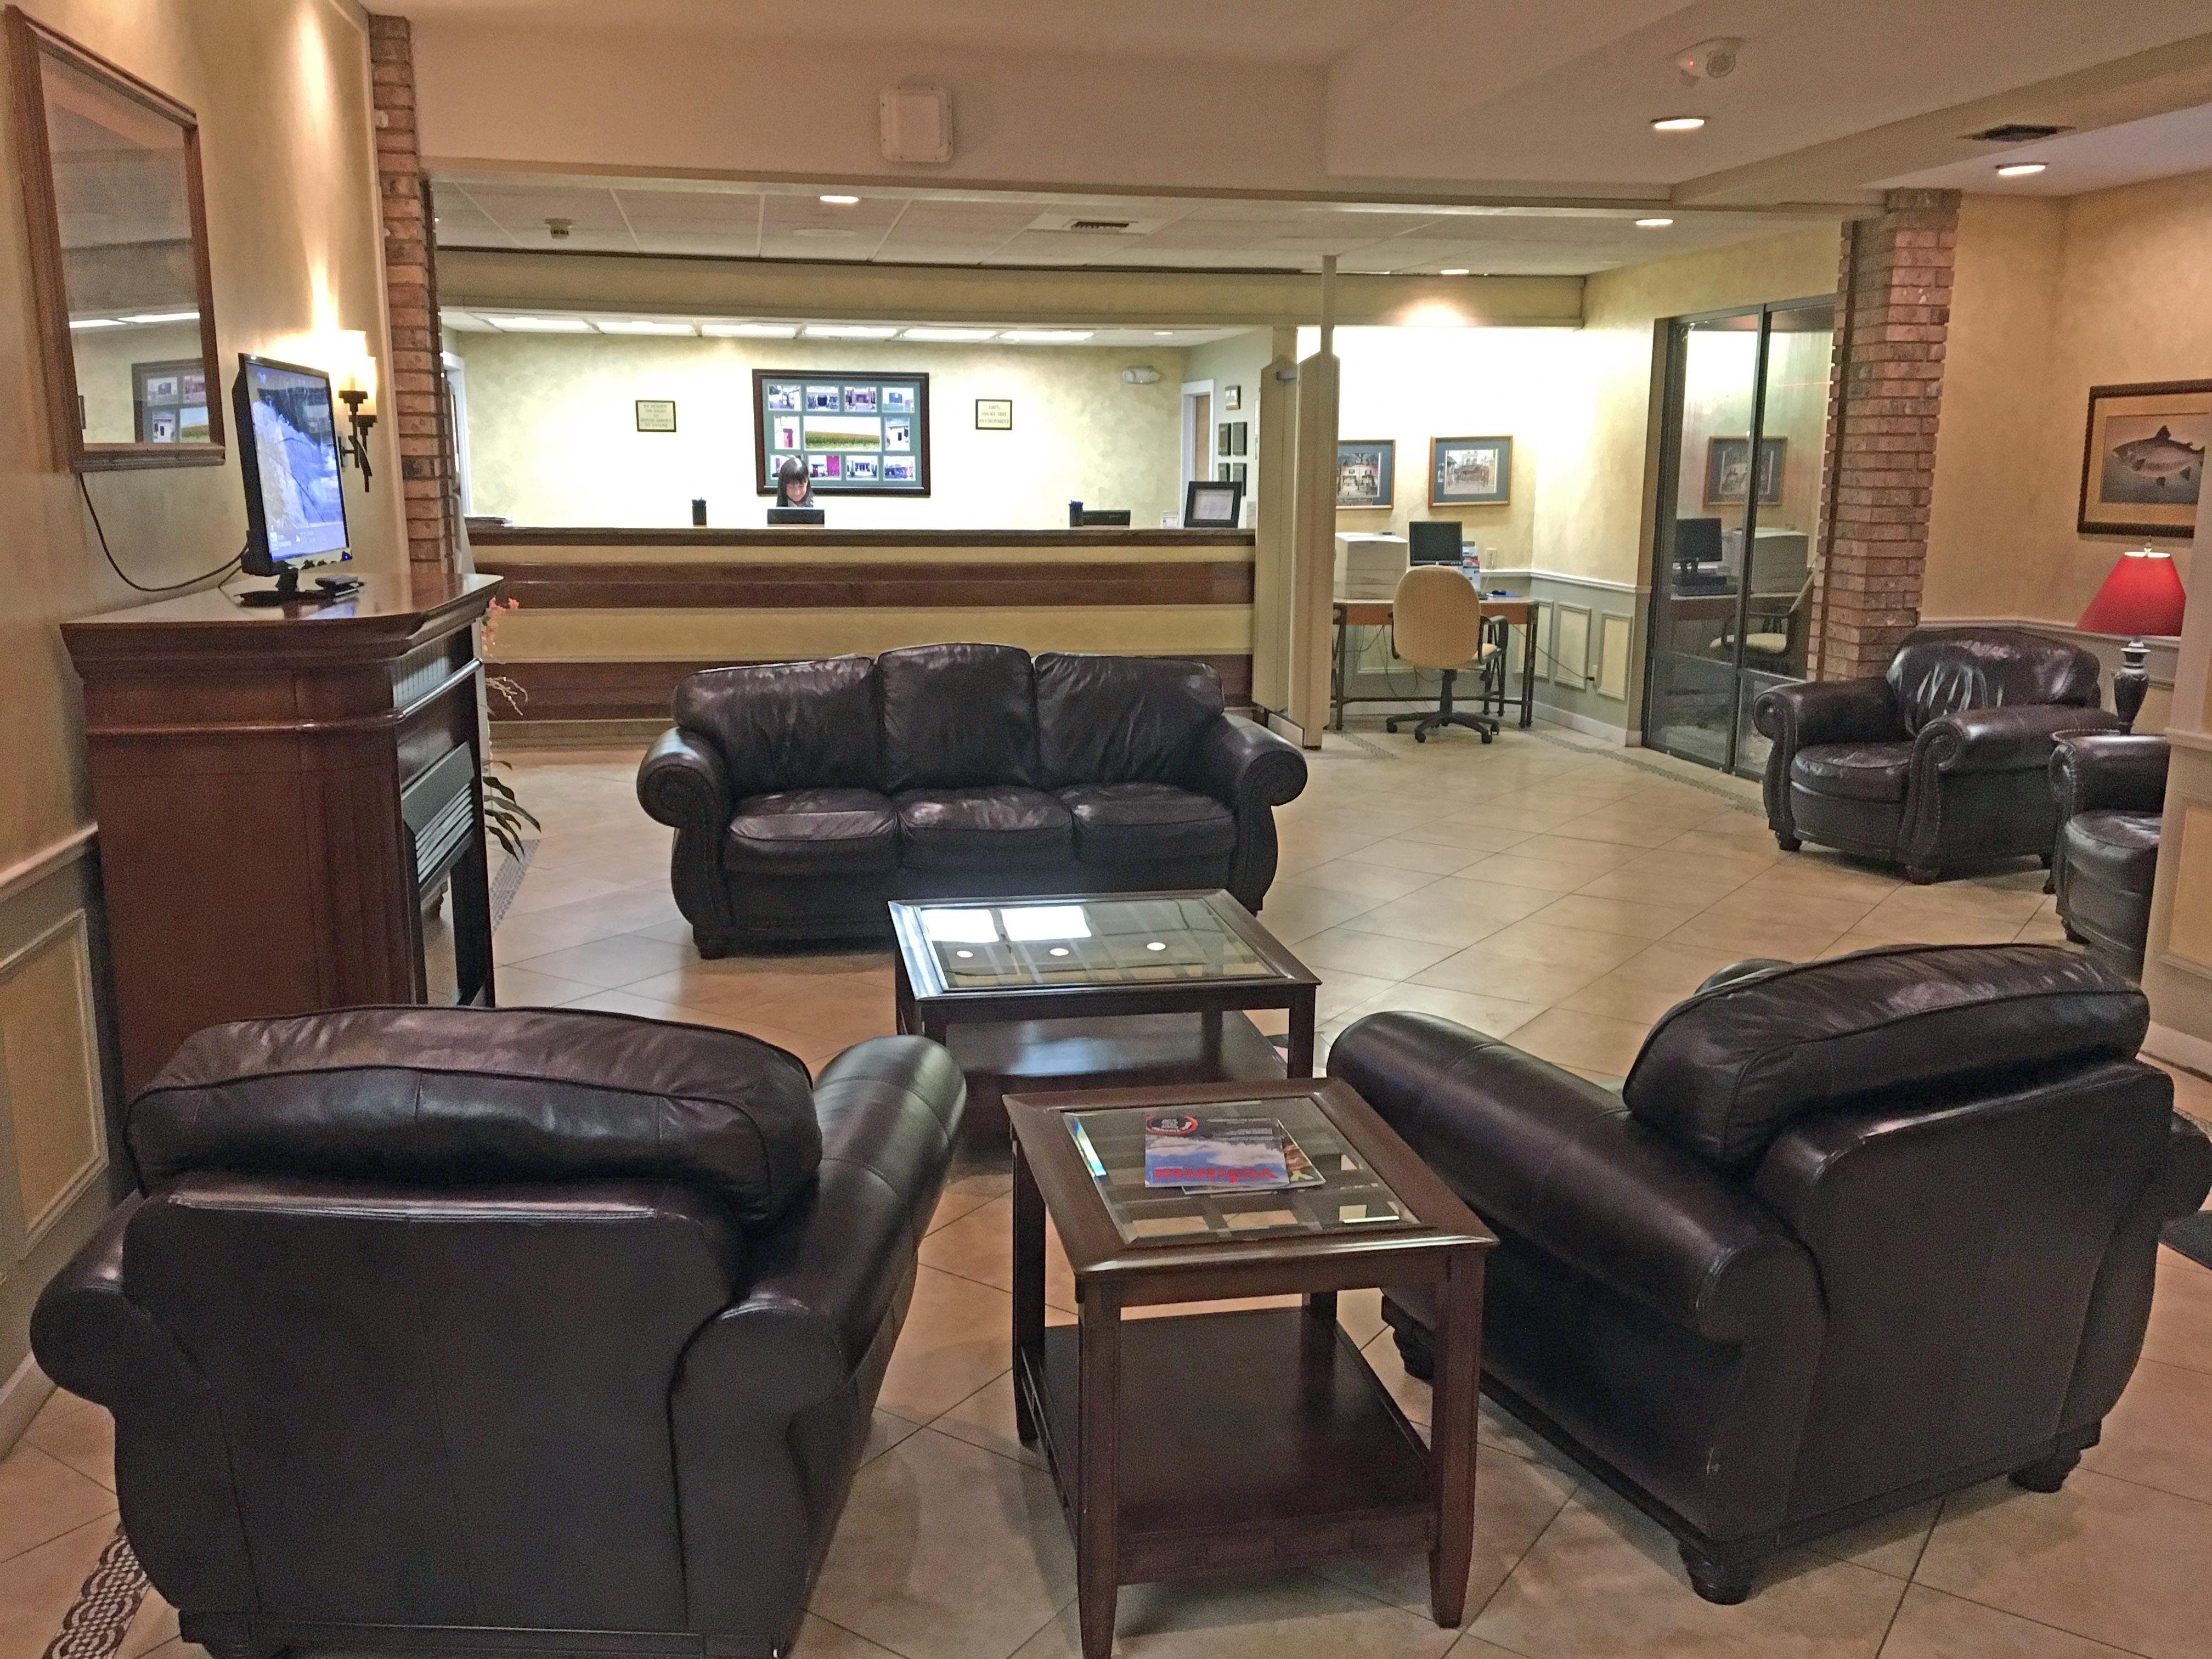 Restaurants In Yakima With Meeting Rooms